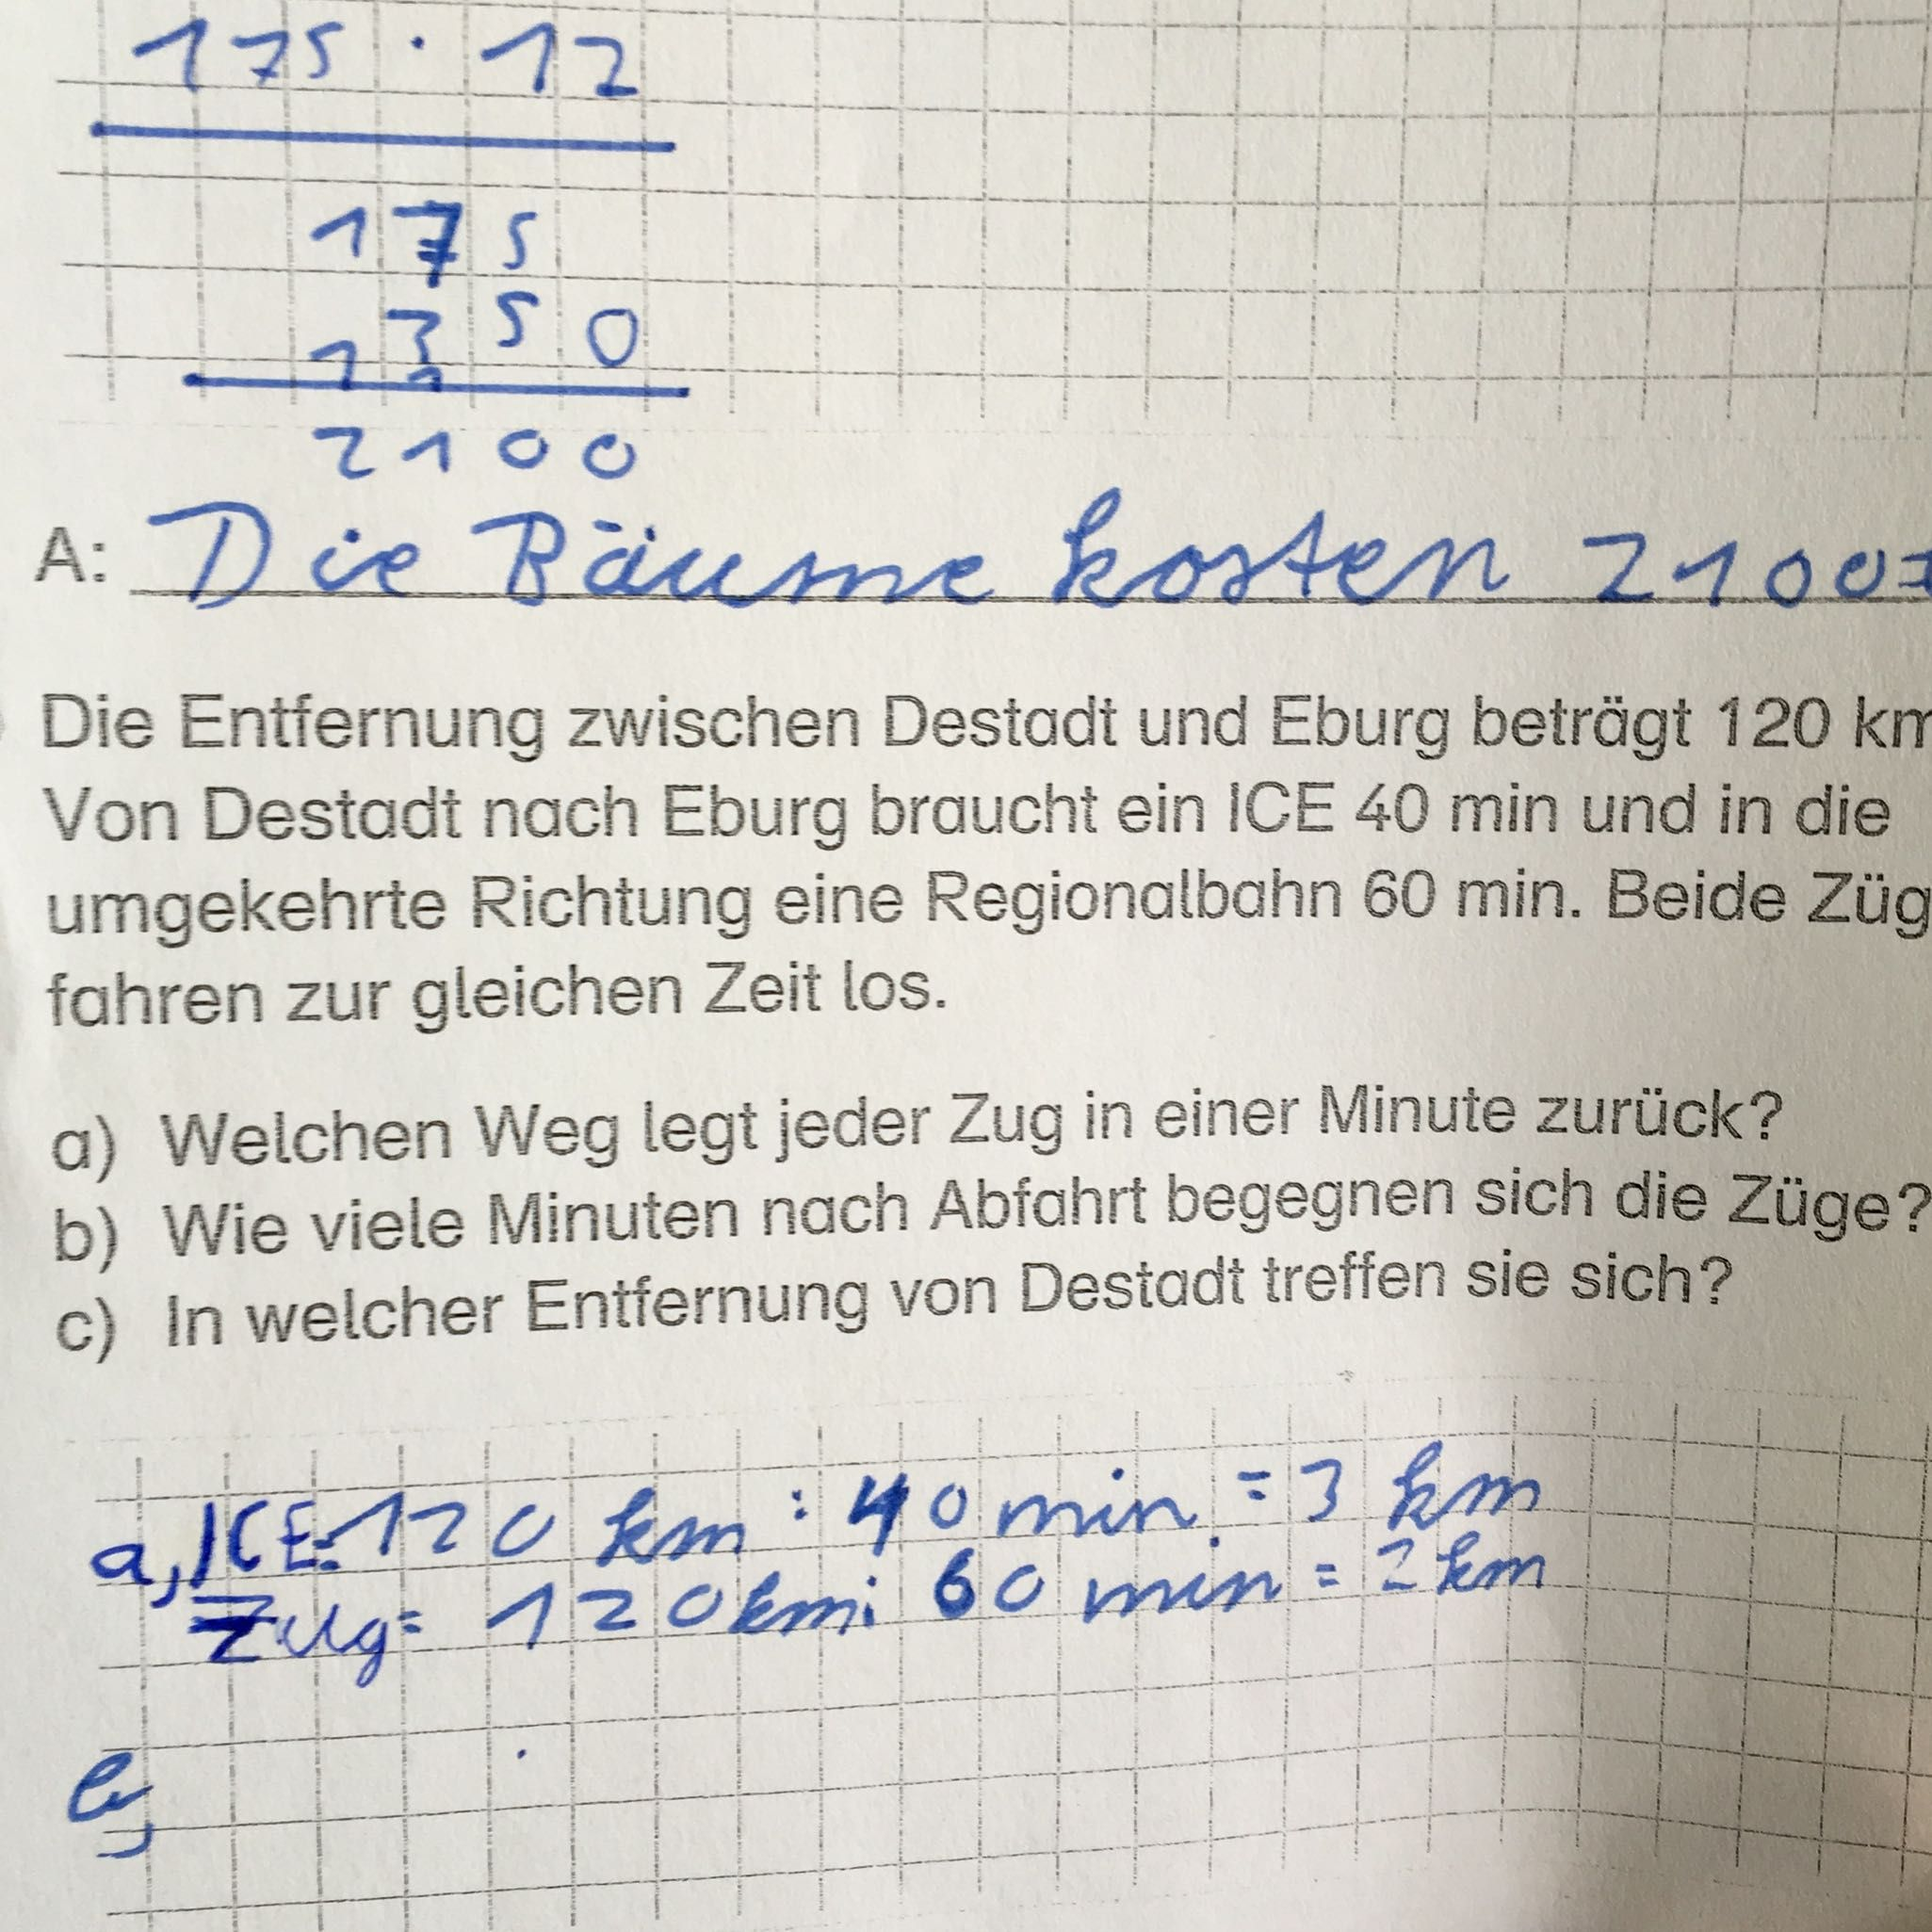 Großzügig Exponent Regel Arbeitsblatt Fotos - Mathe Arbeitsblatt ...